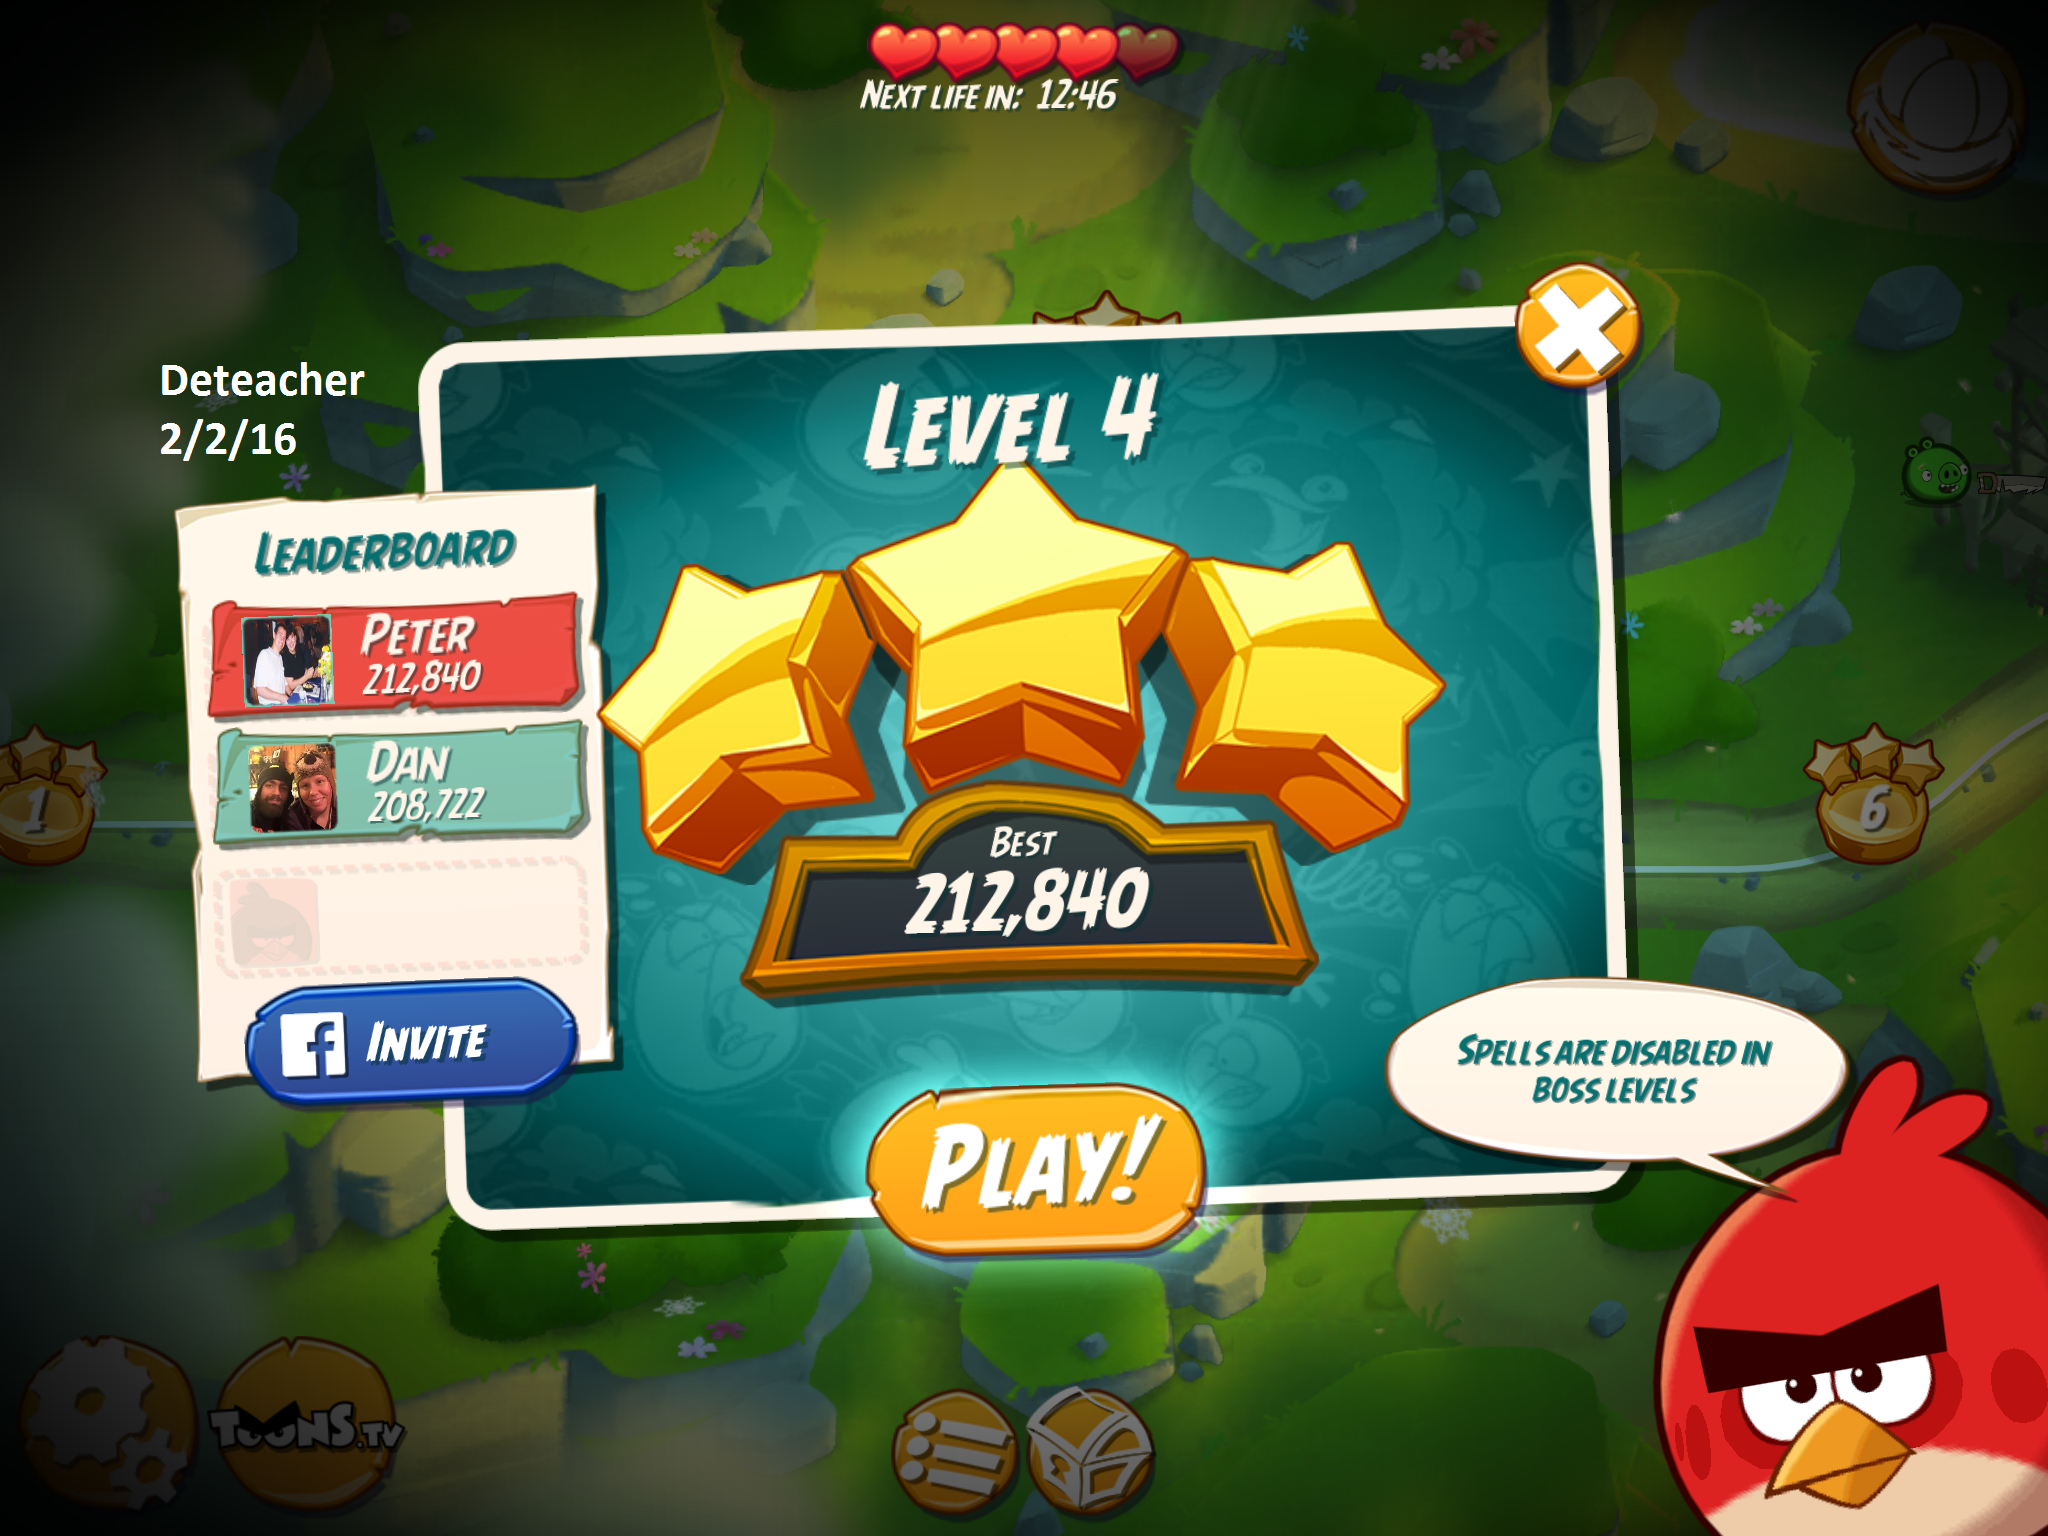 Deteacher: Angry Birds 2: Level 4 (iOS) 212,840 points on 2016-02-02 18:20:24